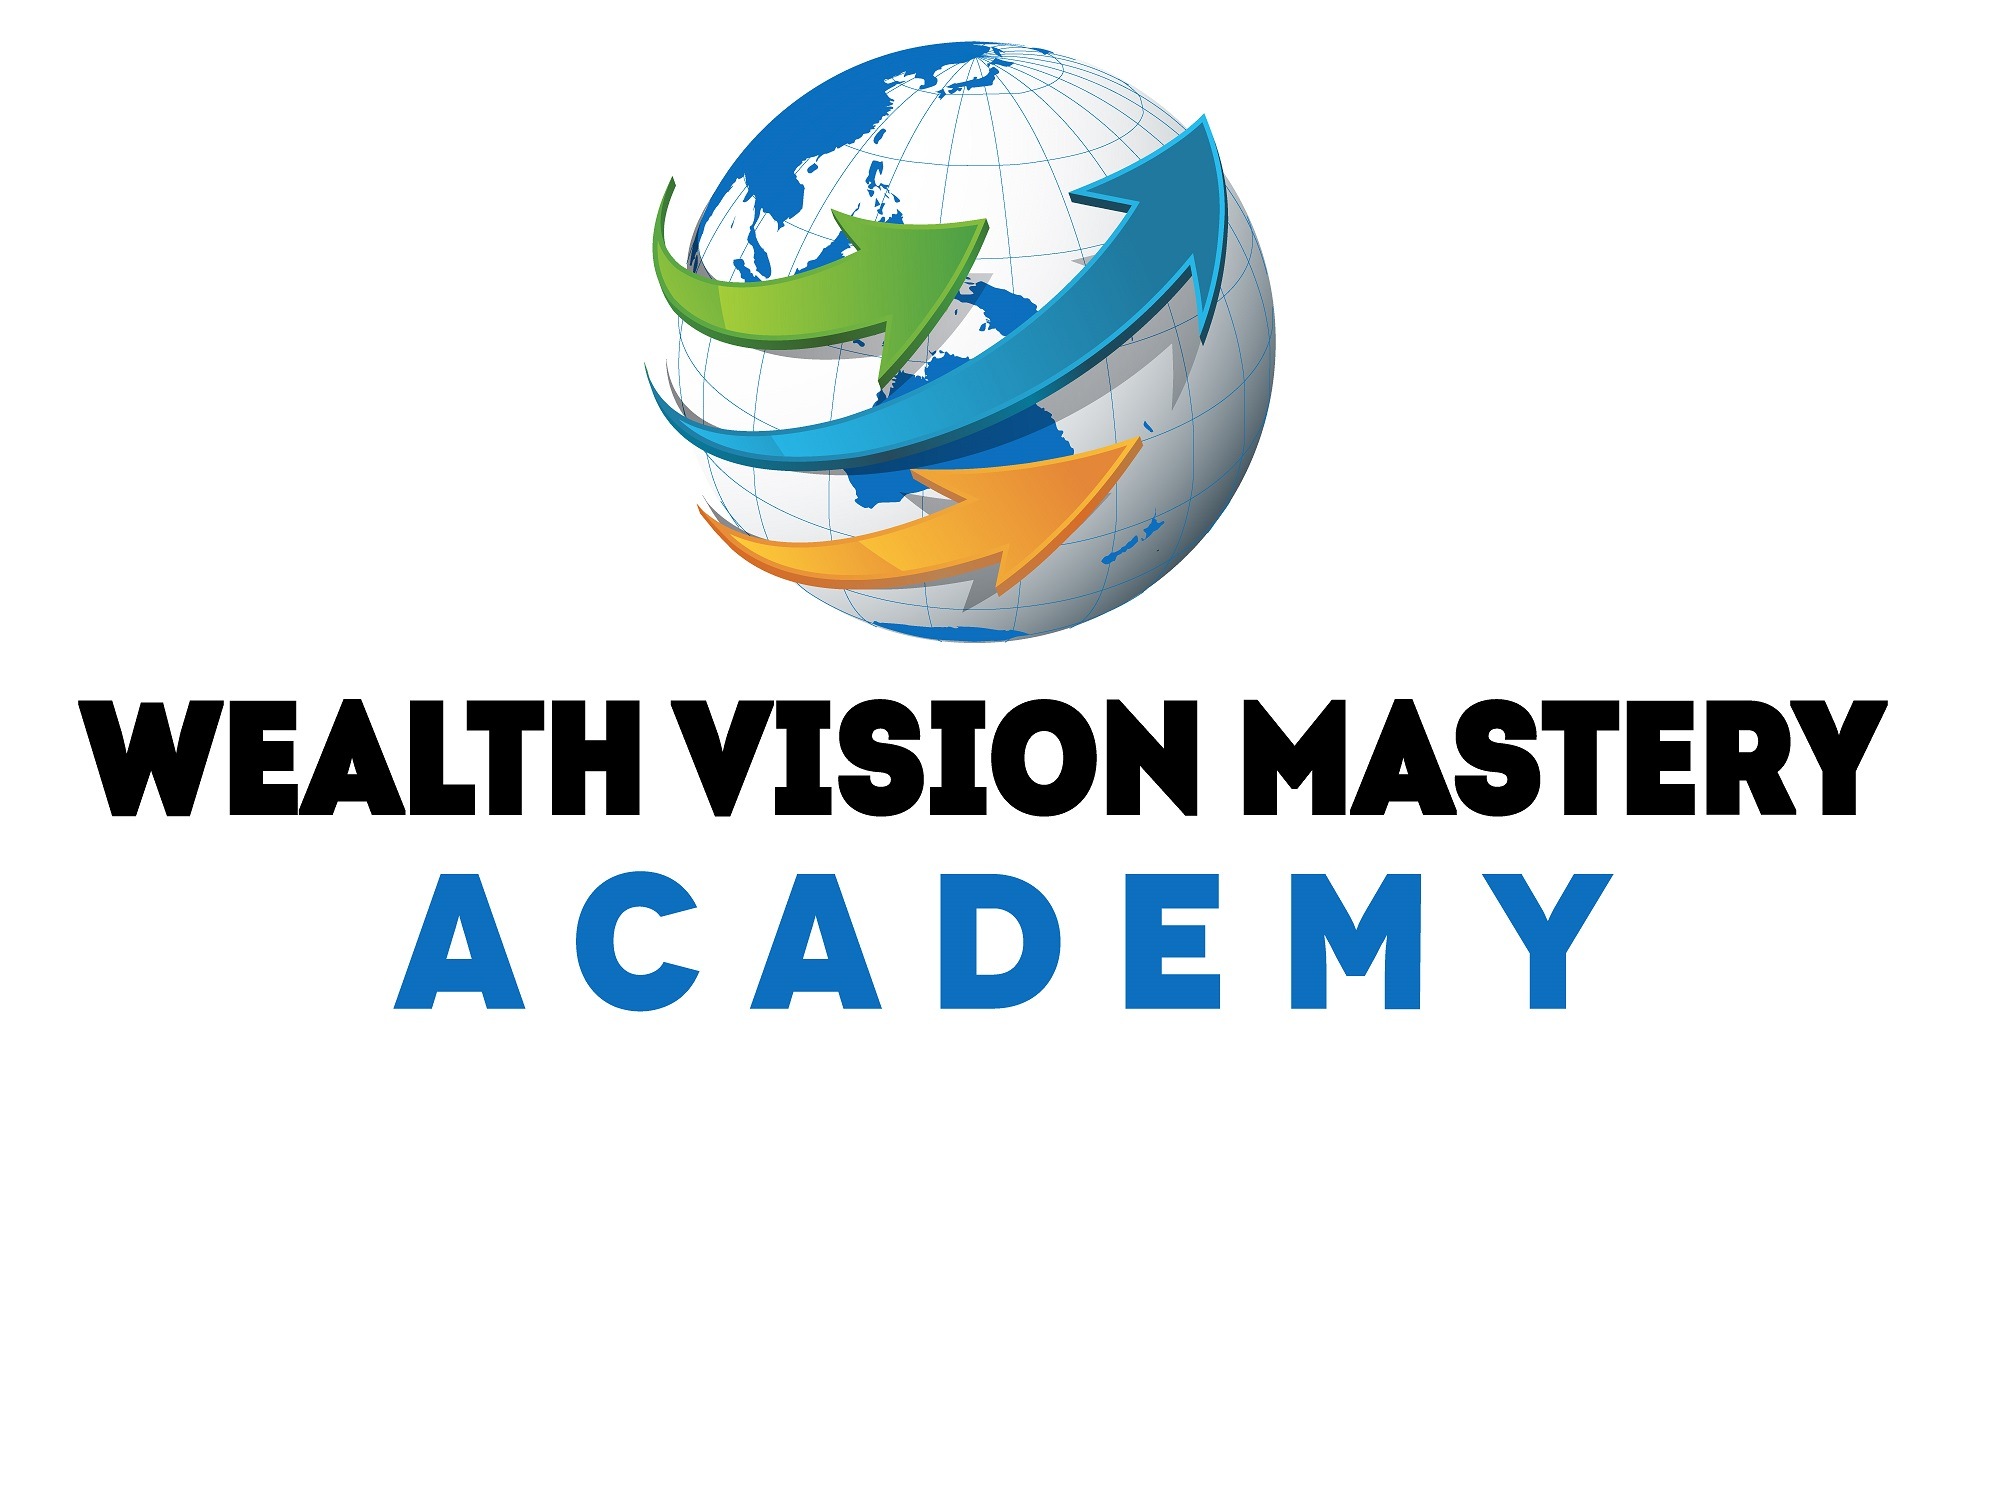 Wealth Vision Mastery Academy Ltd